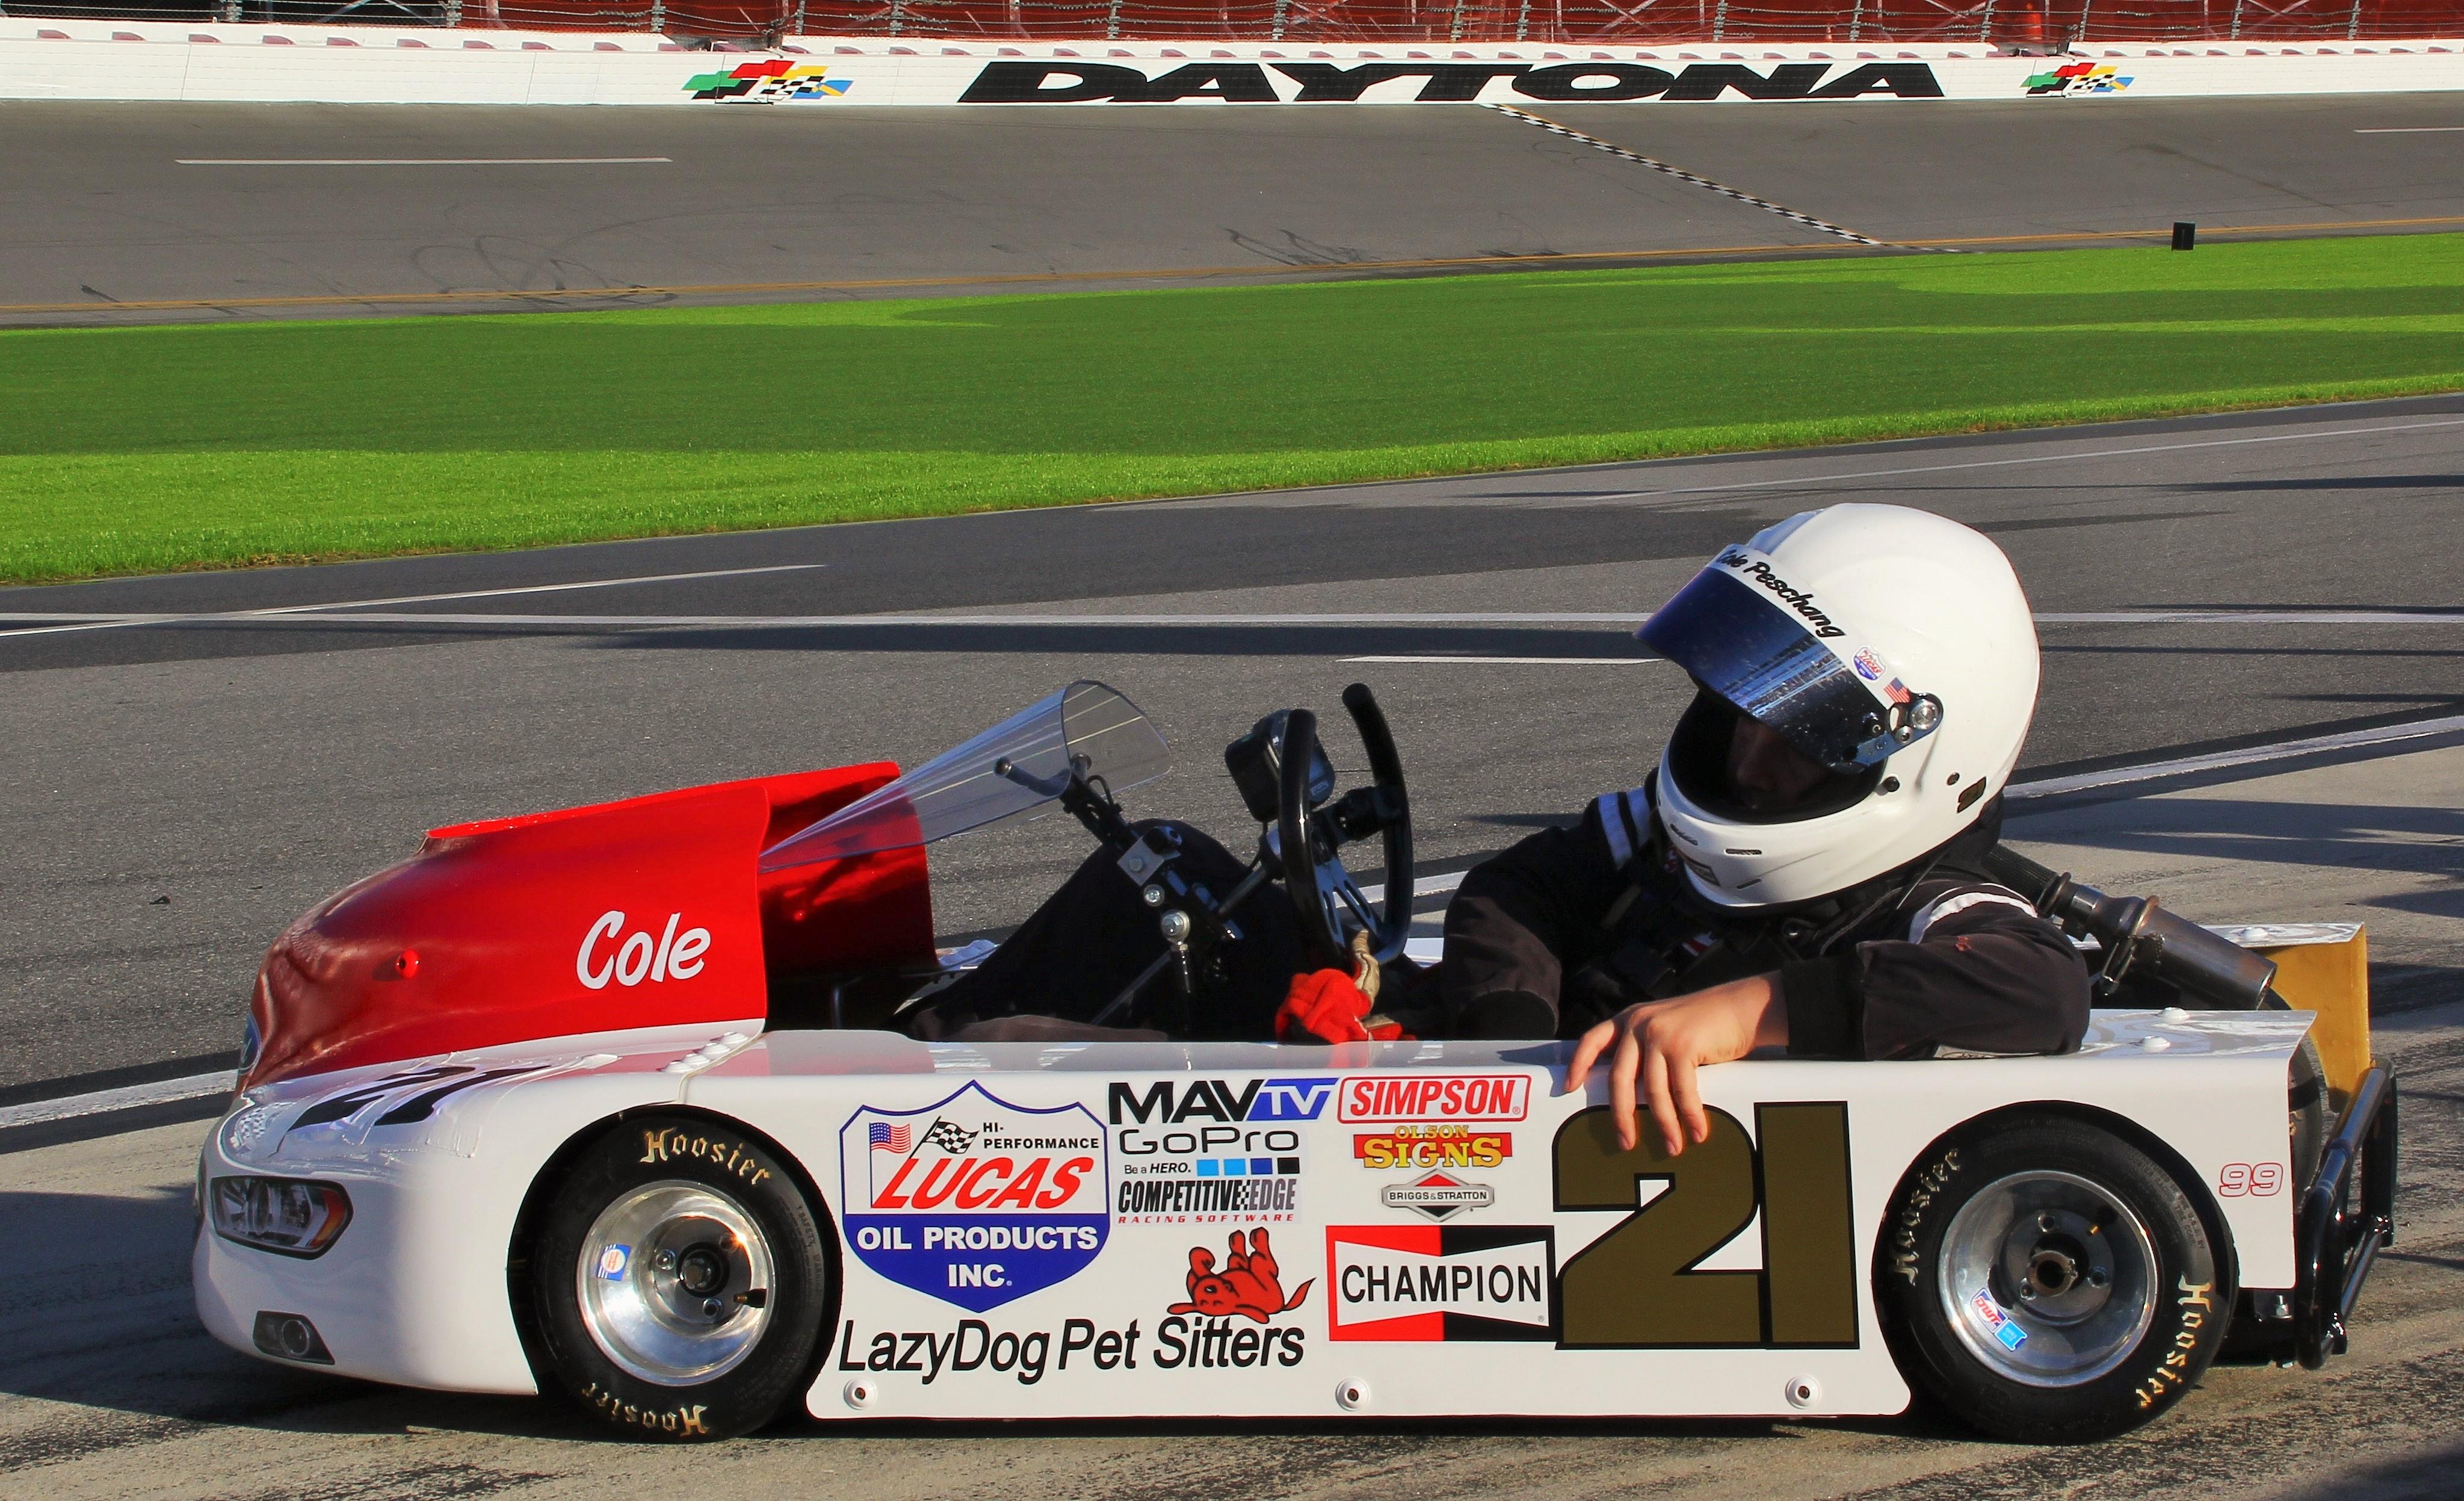 Future Racers at Daytona Kartweek 15 RacingJunk News : IMG2291 from www.racingjunk.com size 4095 x 2494 jpeg 2044kB